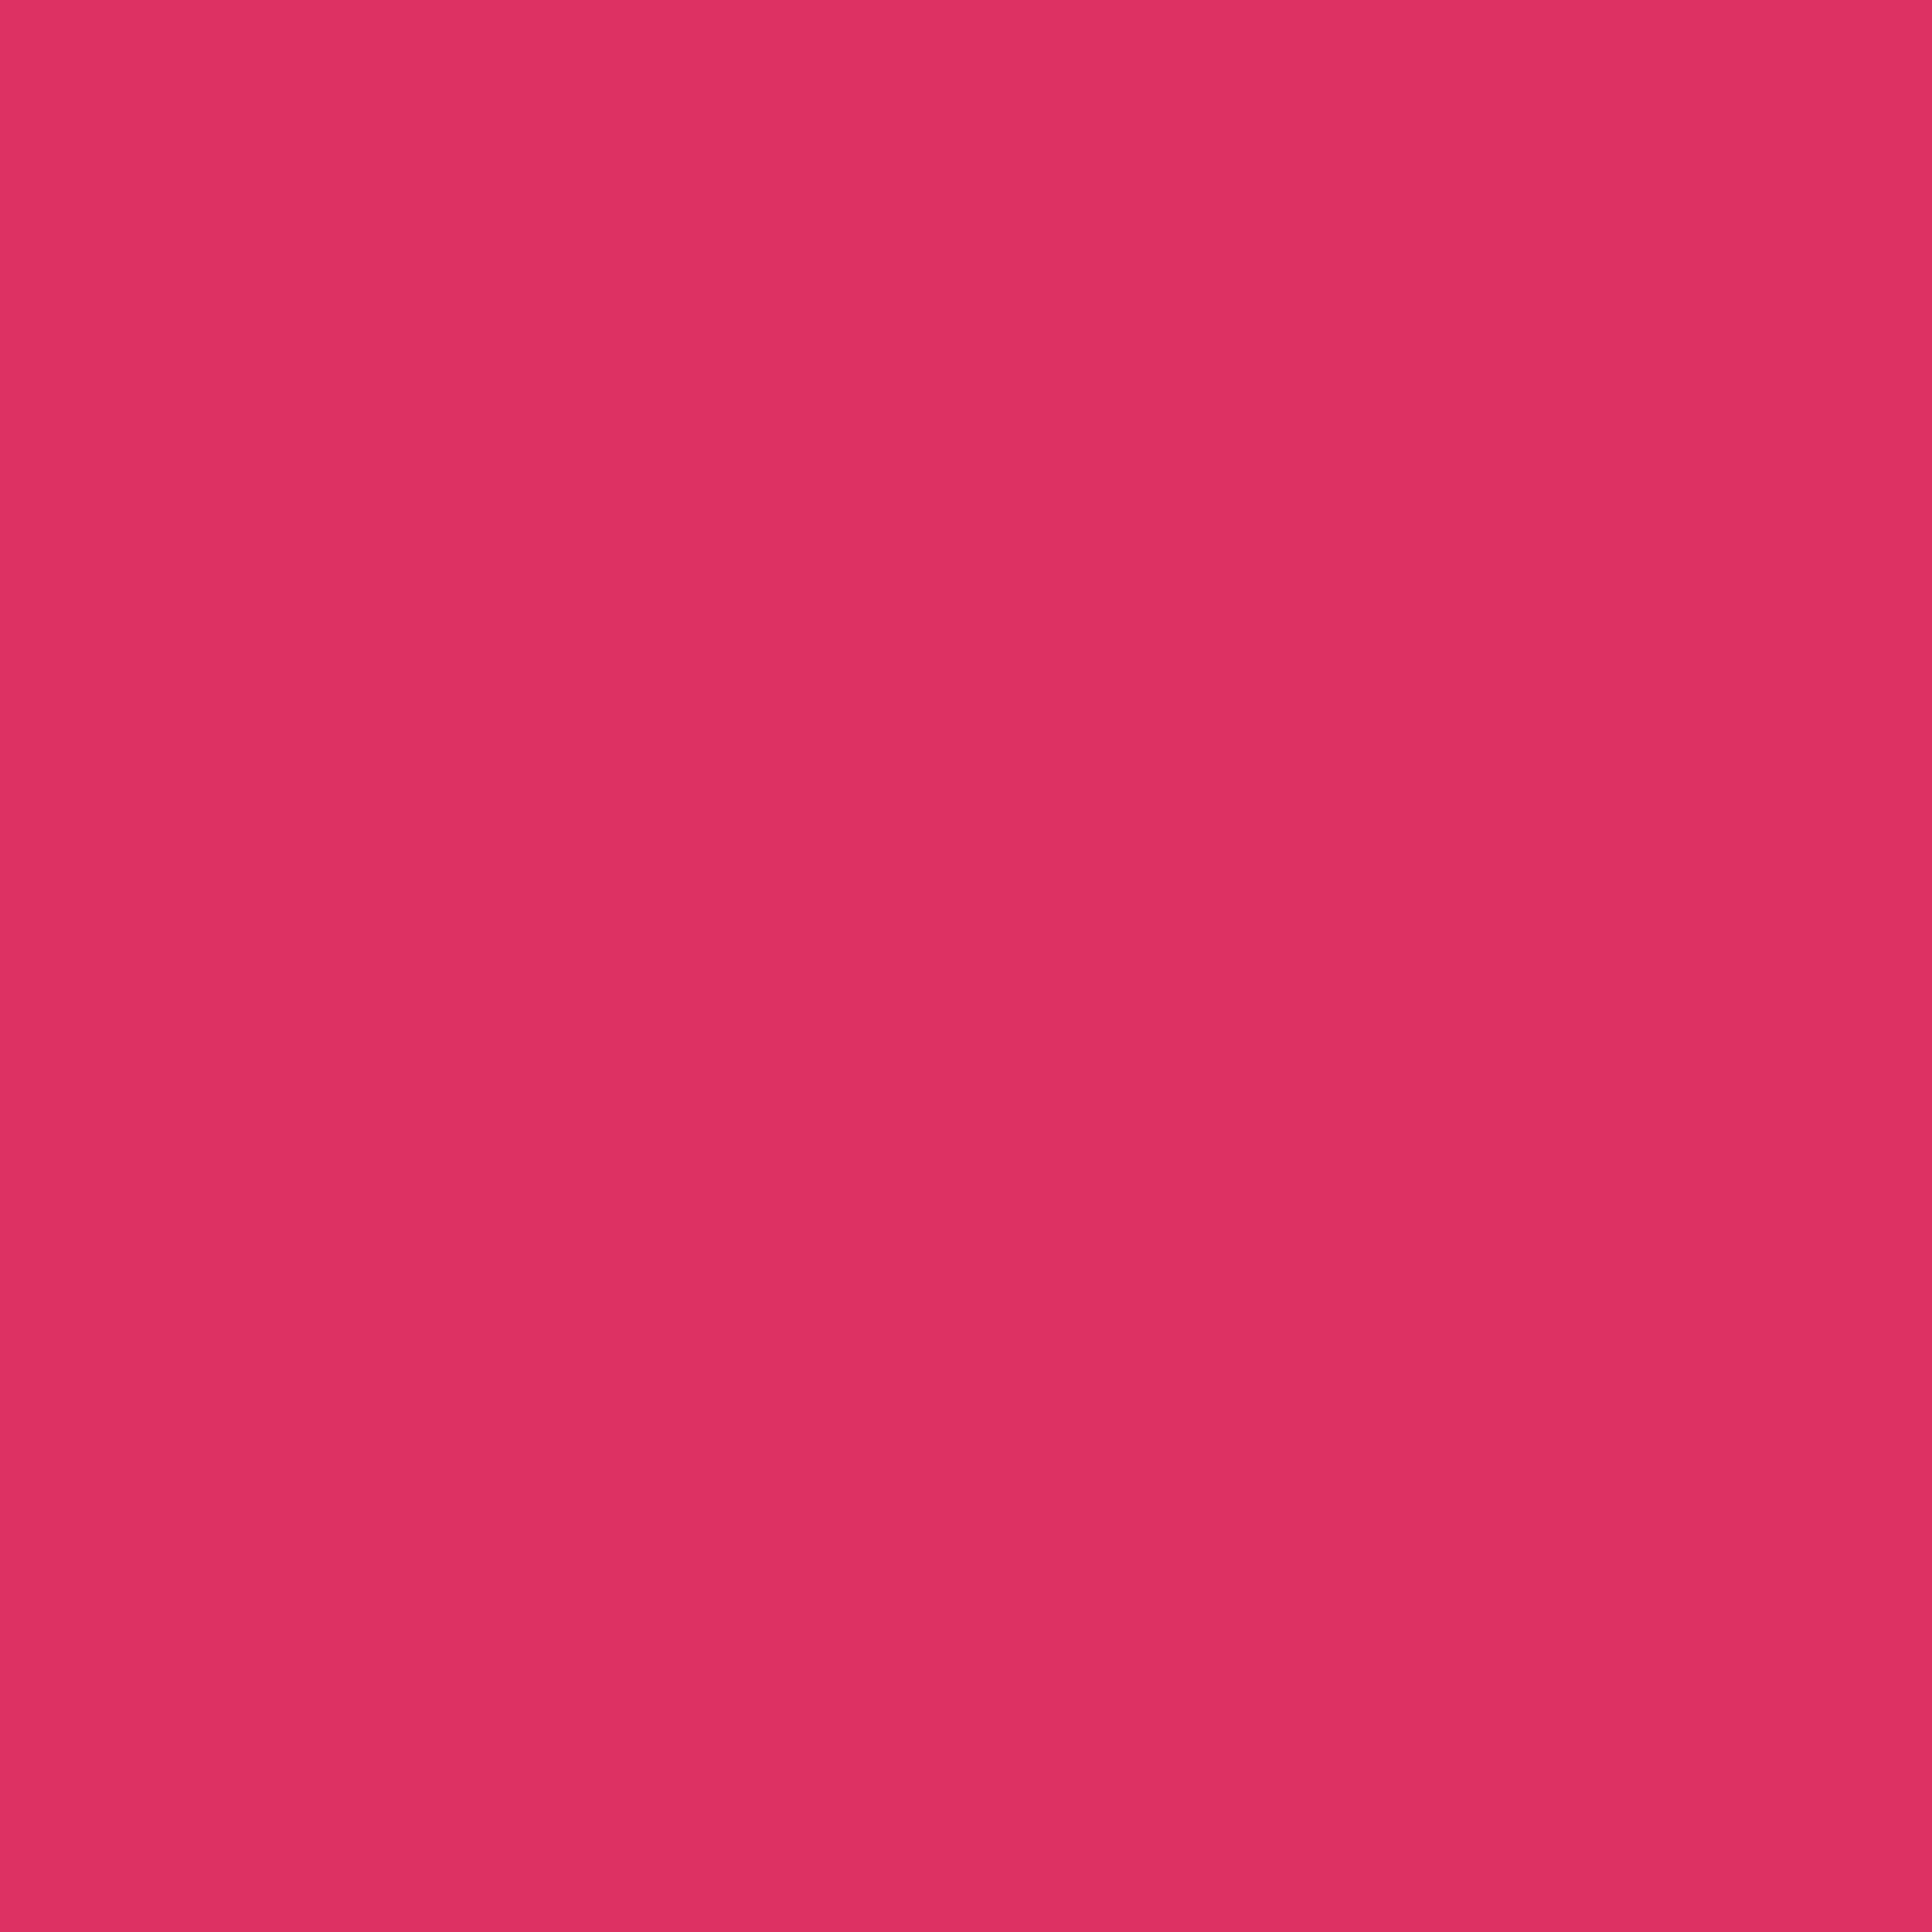 3600x3600 Cerise Solid Color Background